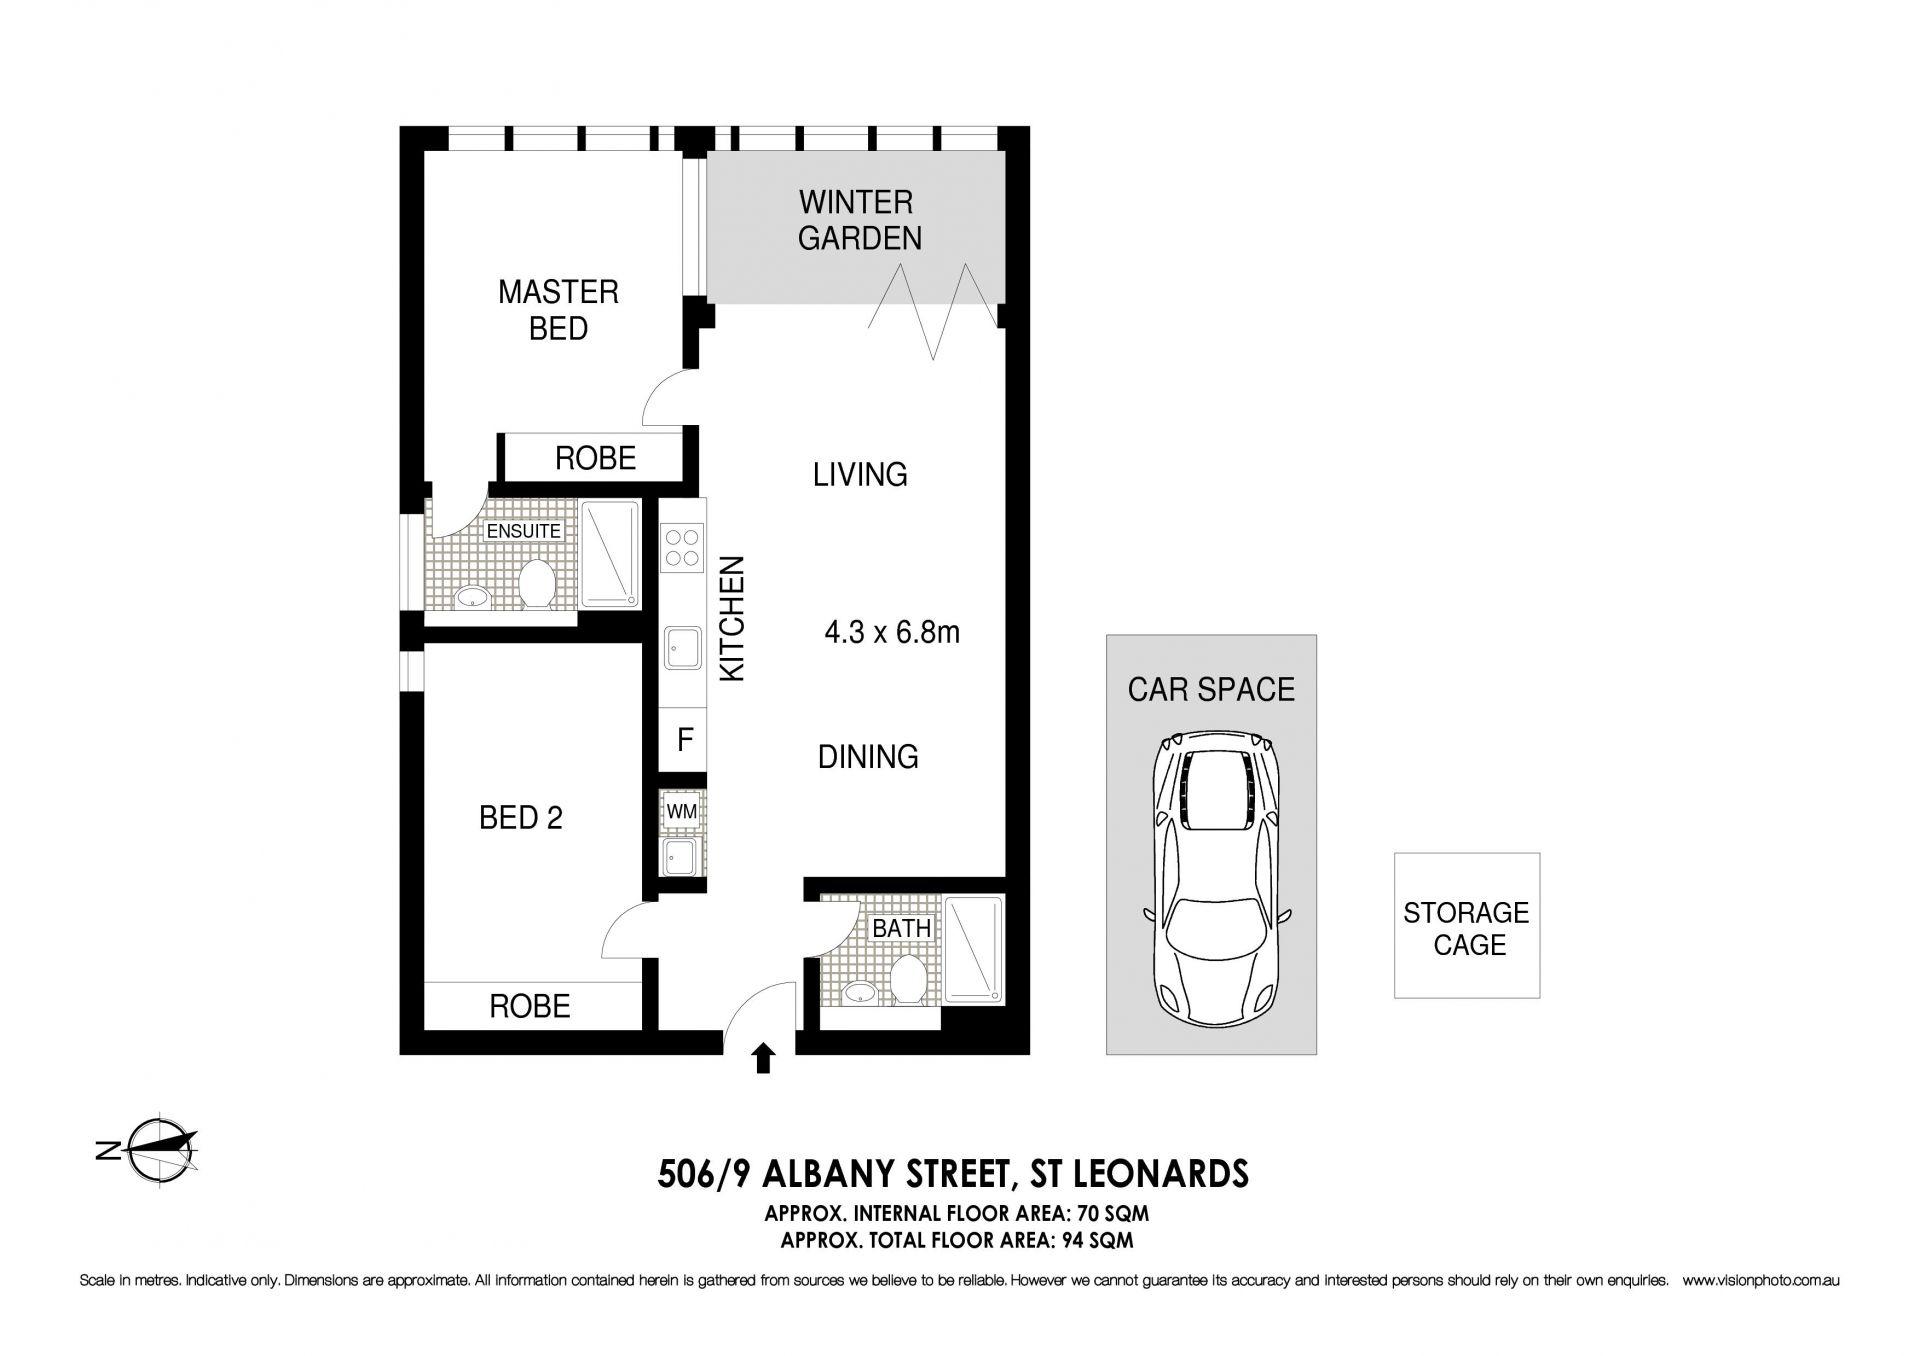 506/9 Albany Street St Leonards 2065